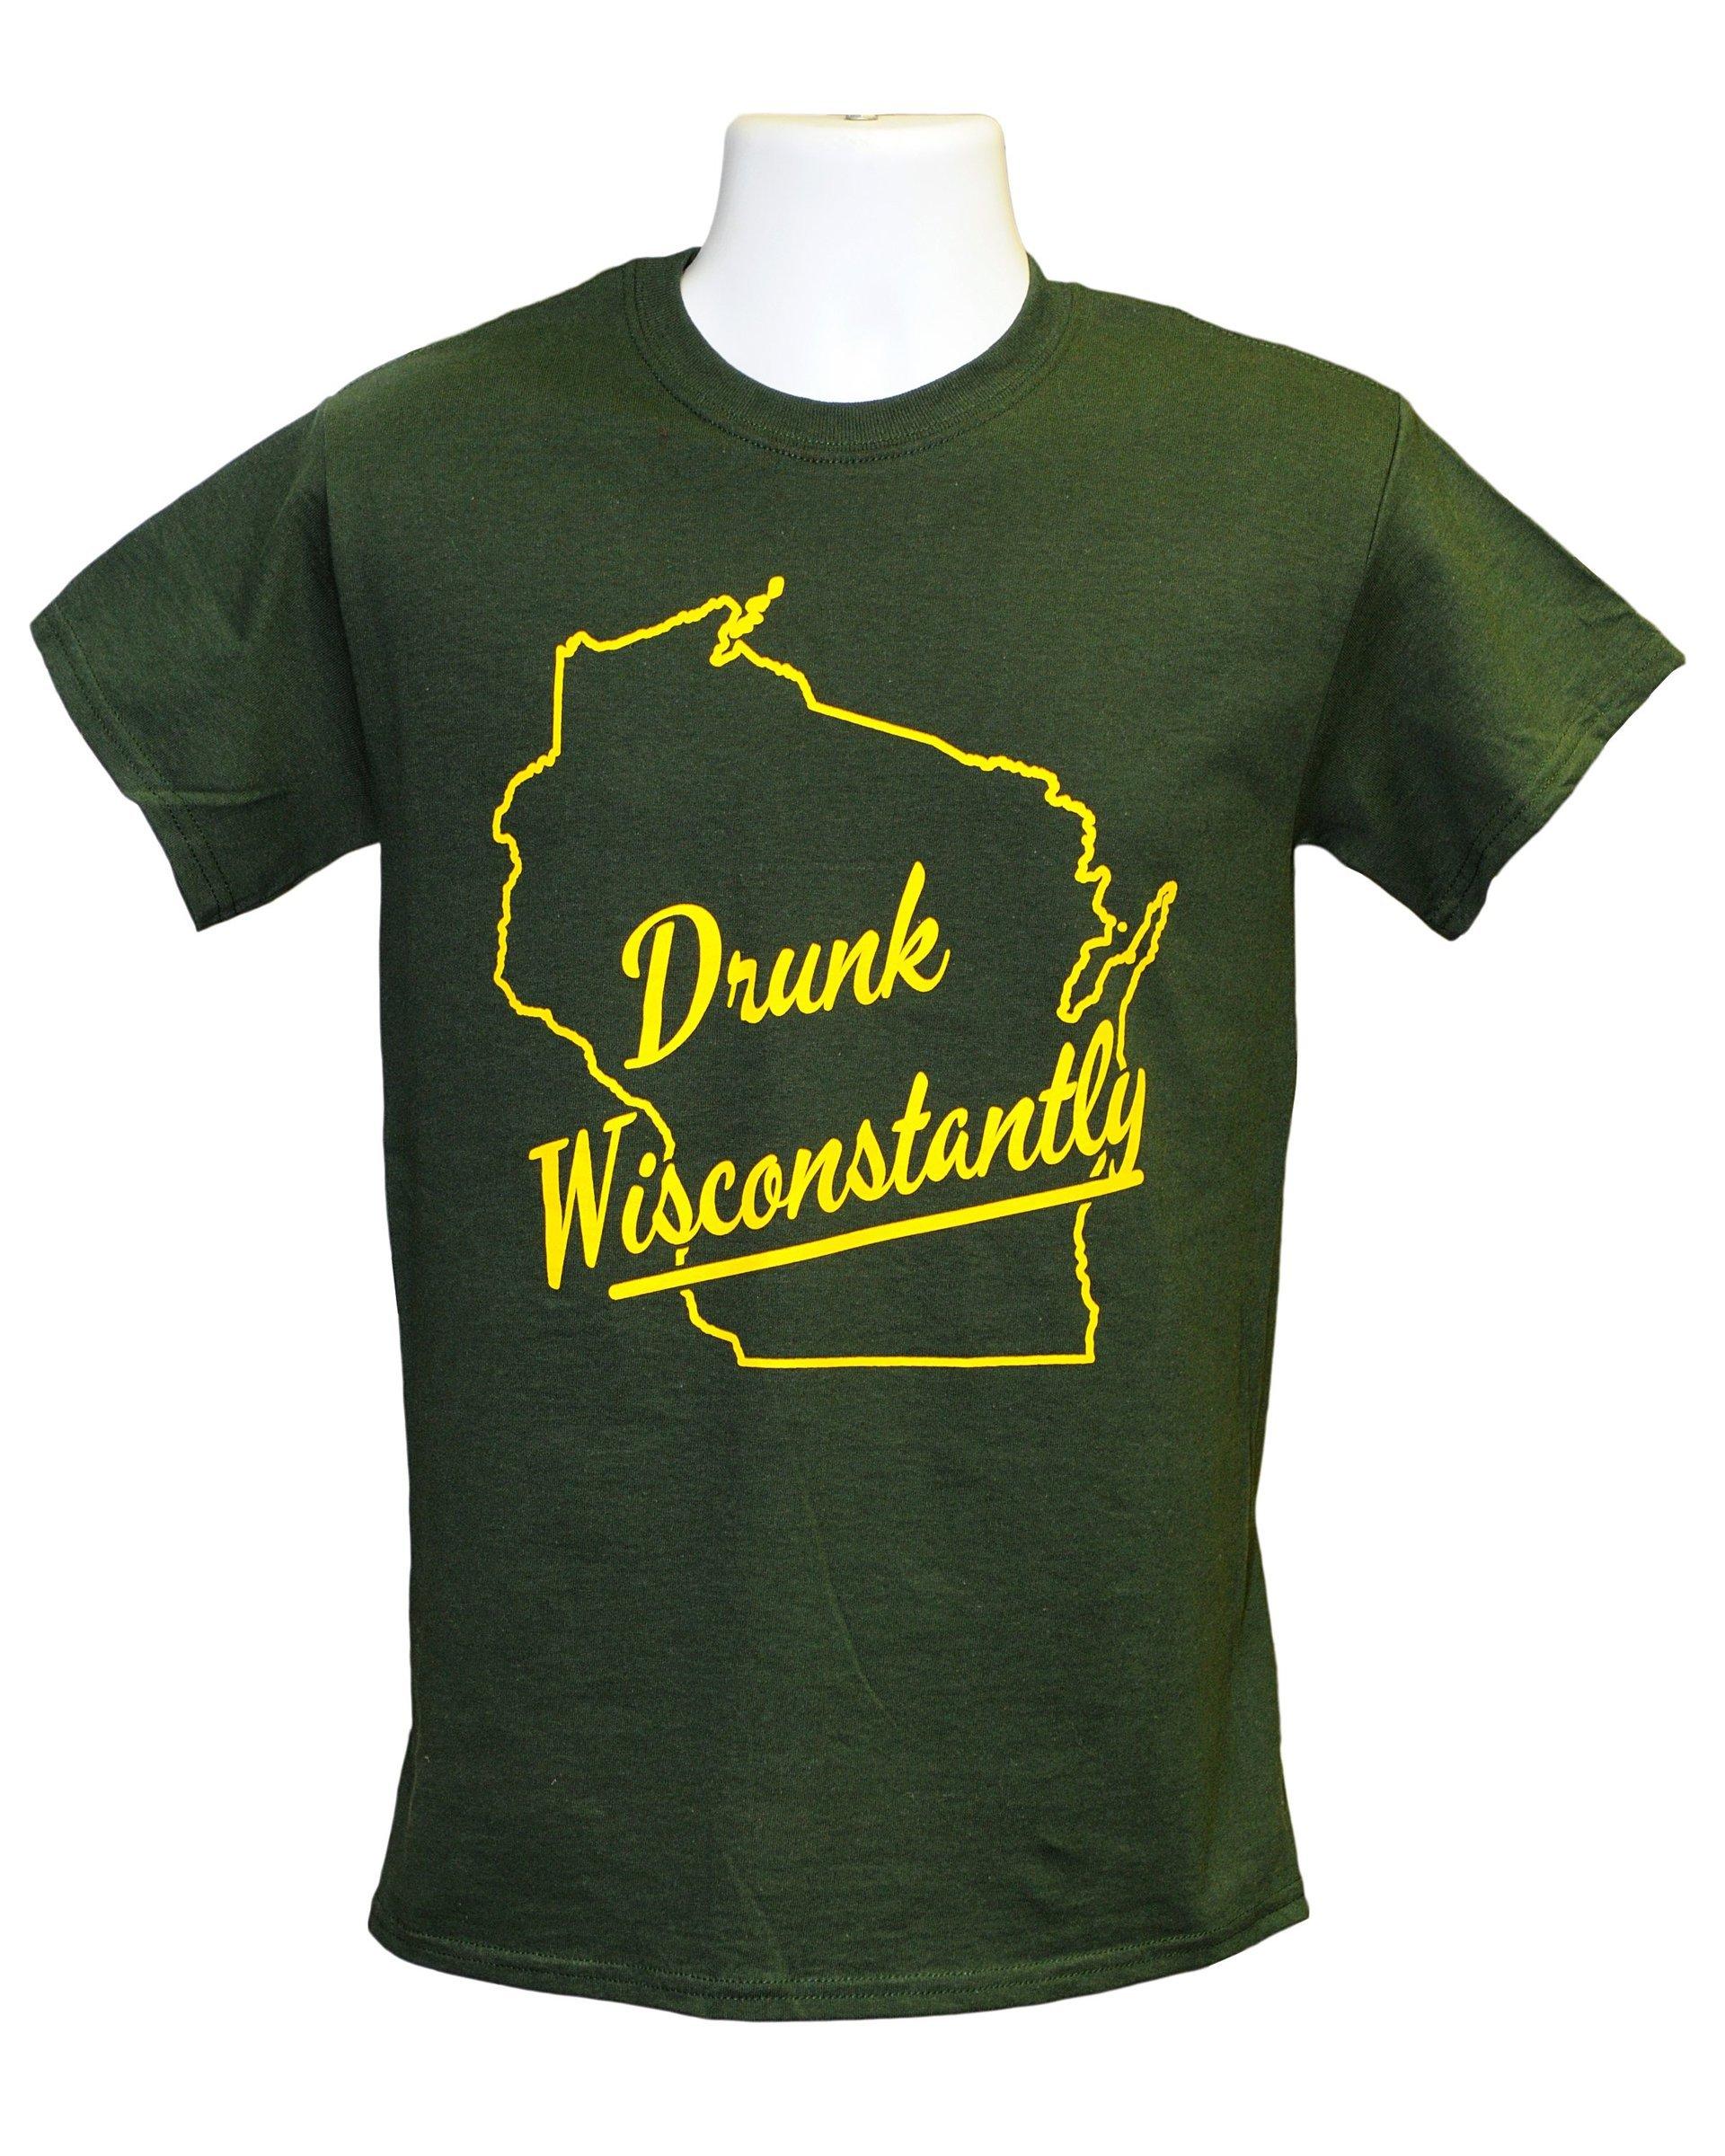 Drunk Wisconstantly Short Sleeve T-Shirt